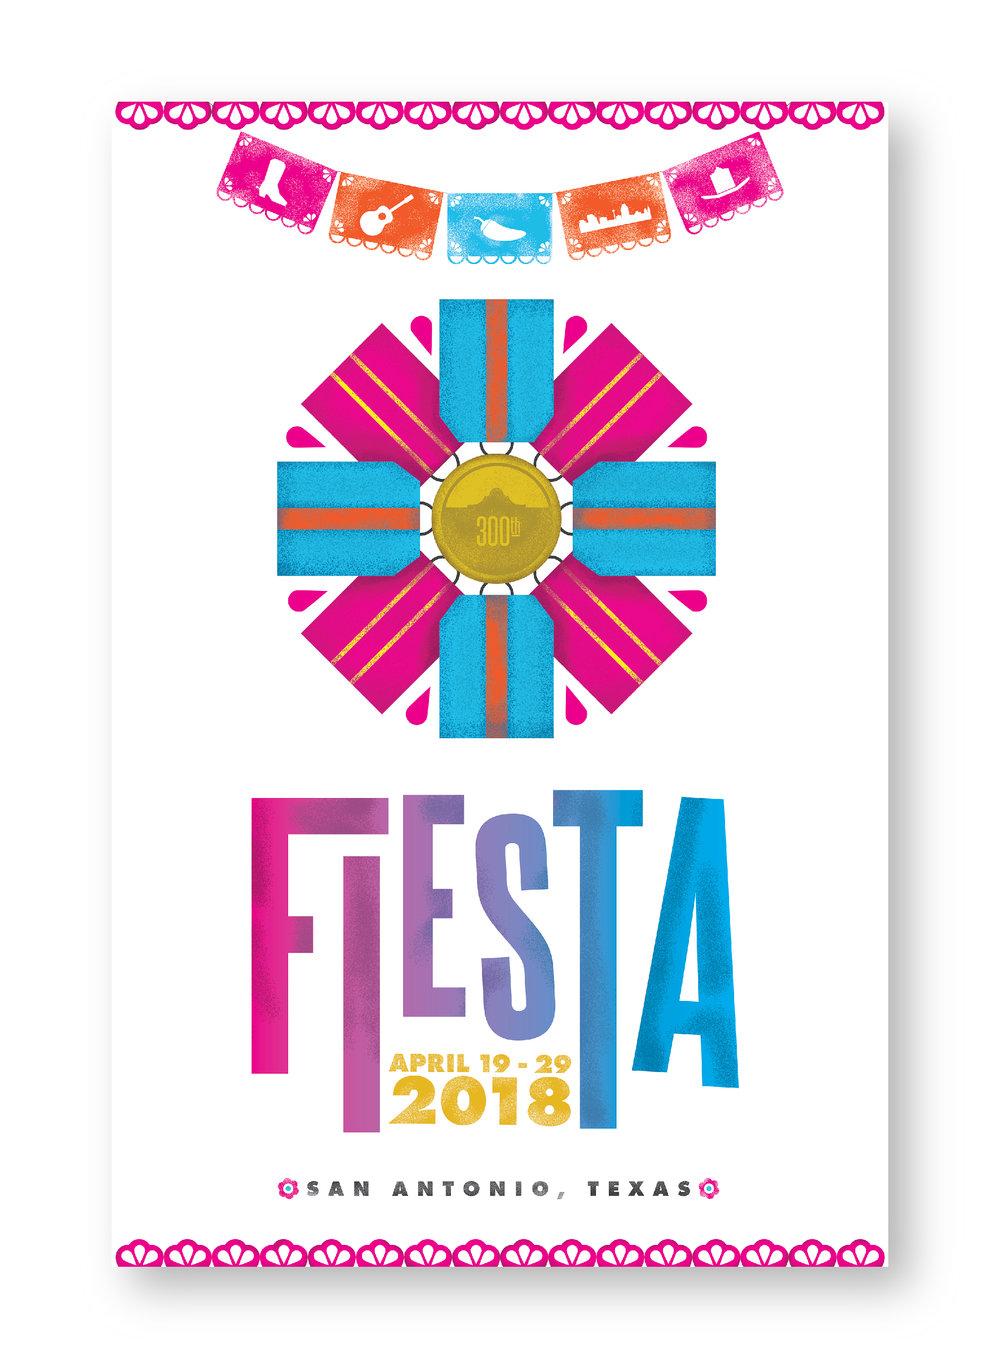 fiesta_website-01.jpg